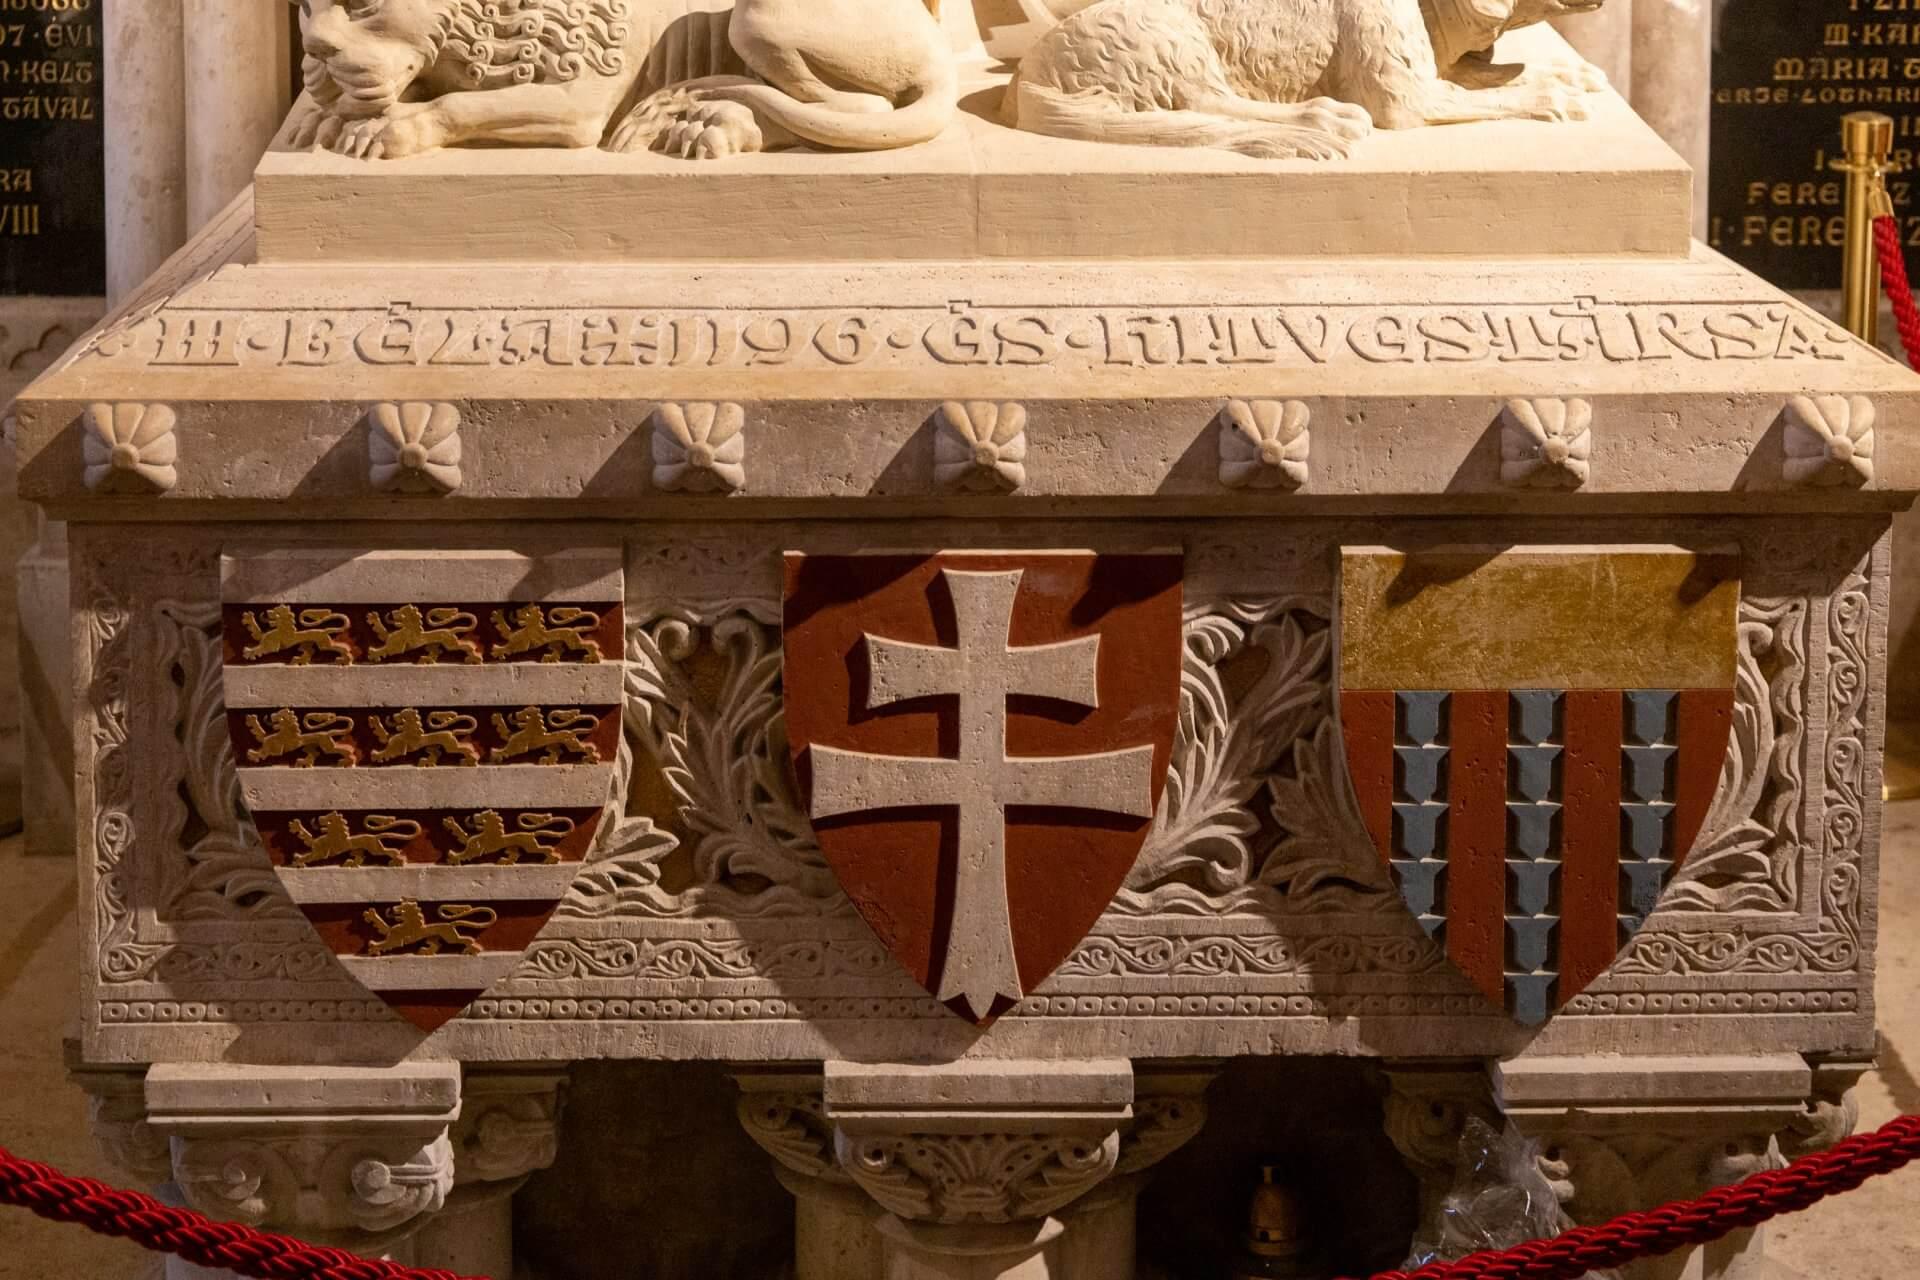 Wappen am Sarkophag der Béla-Kapelle